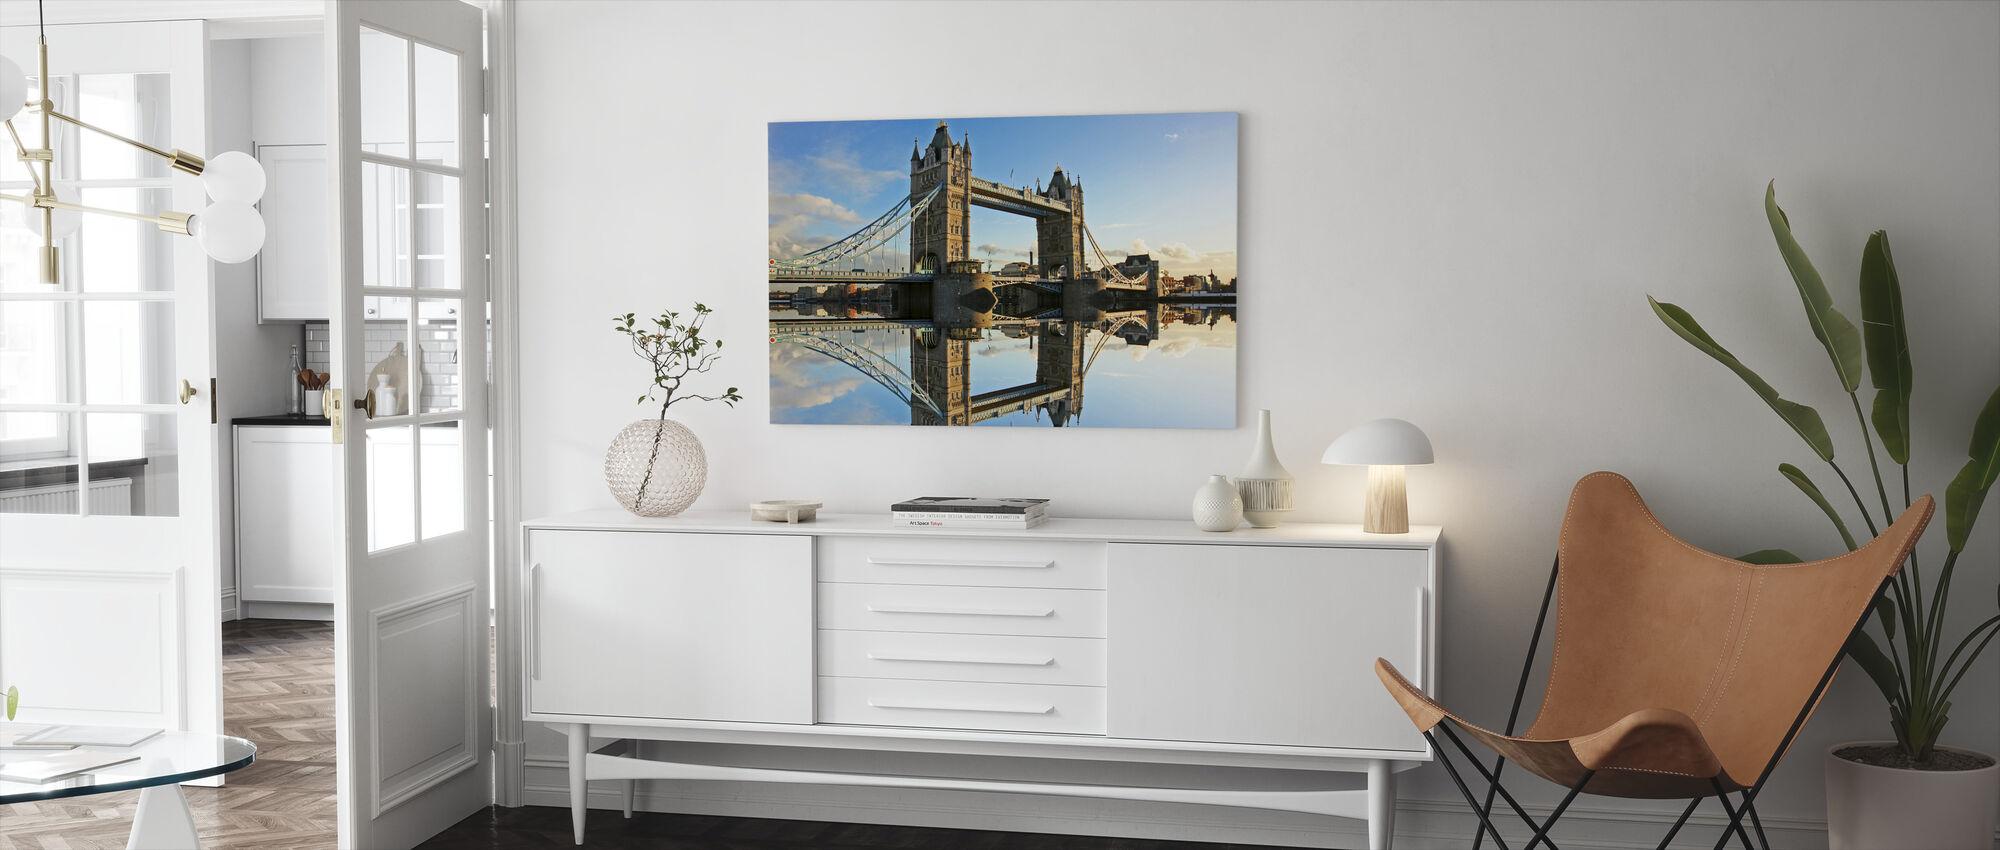 Tower Bridge ved solnedgang - Lerretsbilde - Stue